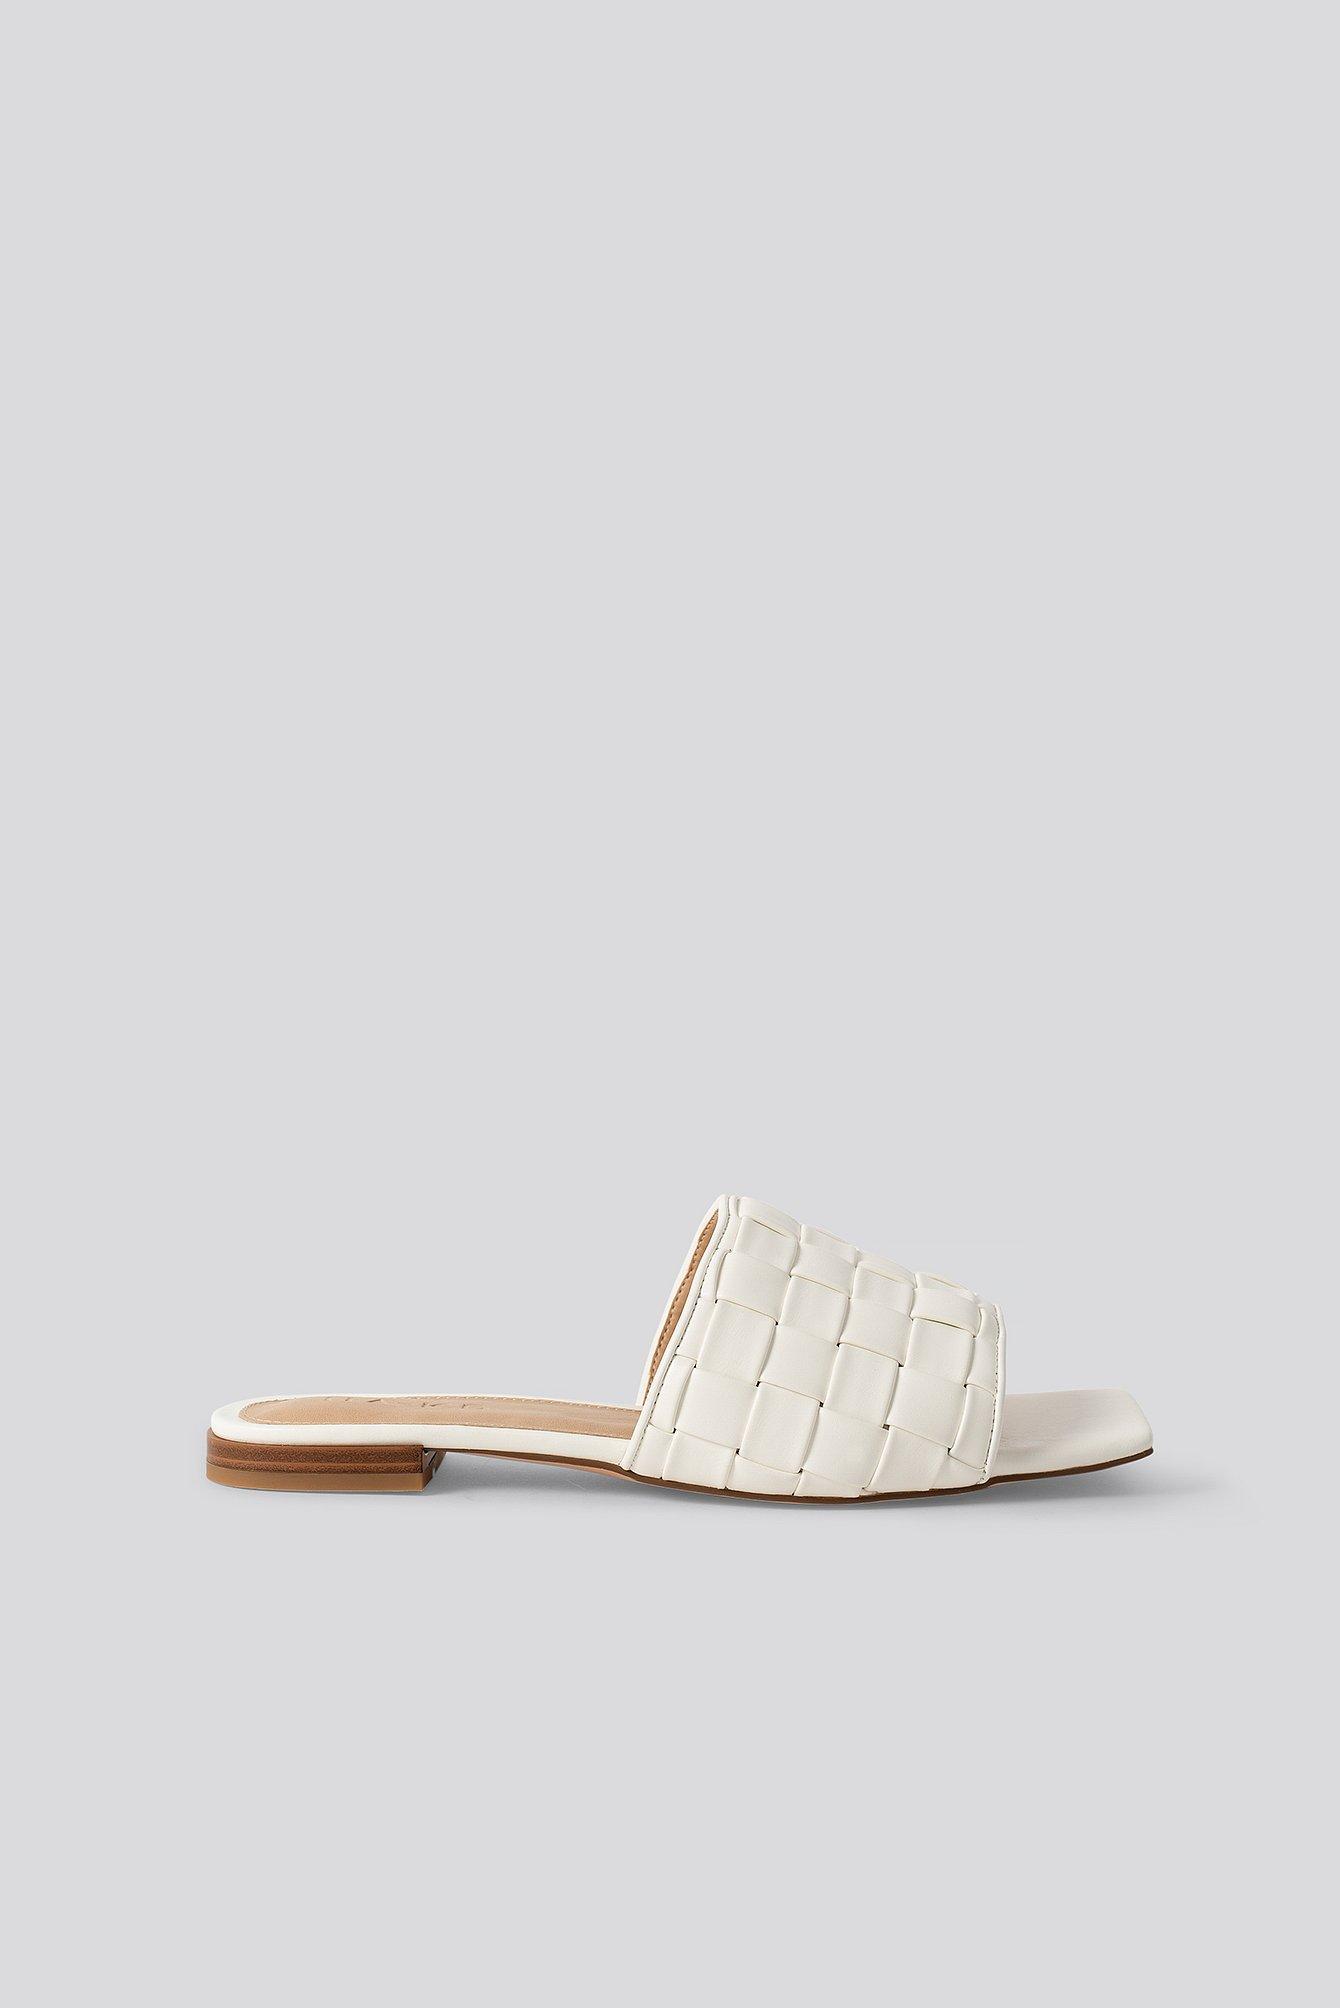 na-kd shoes -  Braided Flats - White